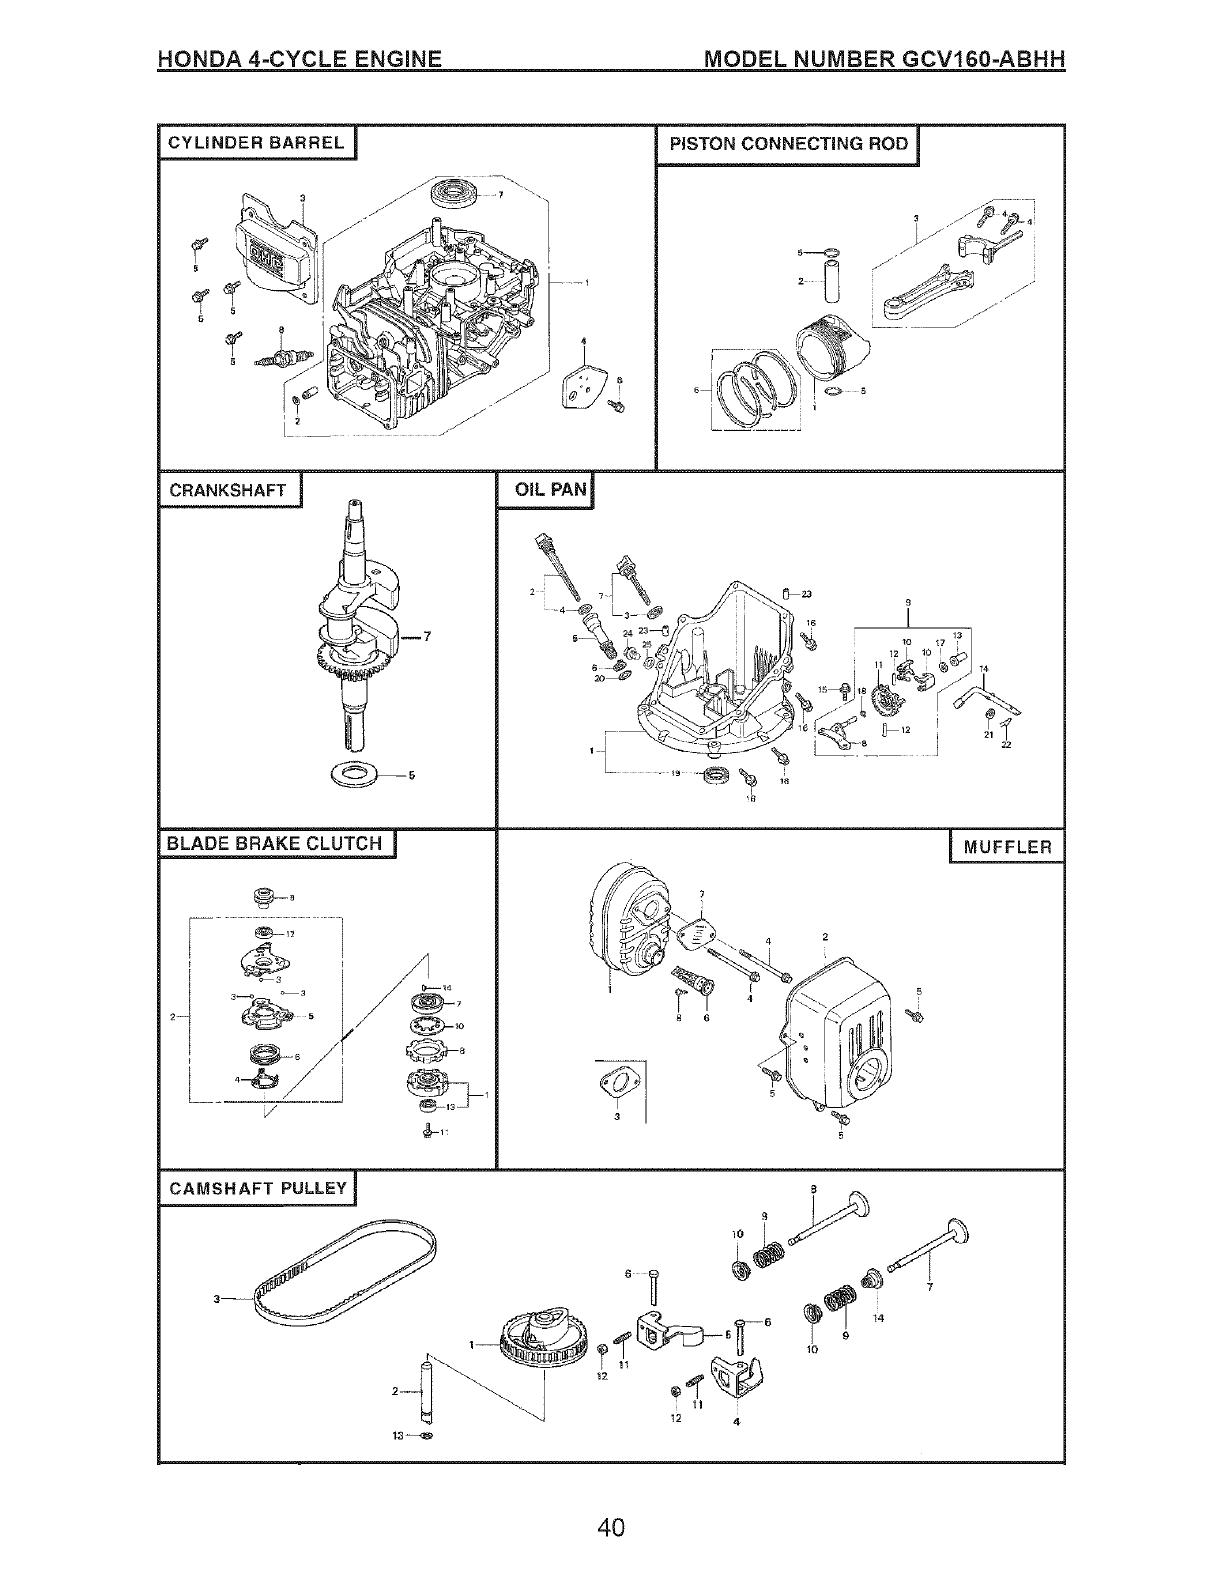 Craftsman 917377042 User Manual Mower Manuals And Guides L0803299 Honda Gc160 5 0 Engine Spring Diagram 4cycle Model Number Gcv160abhh